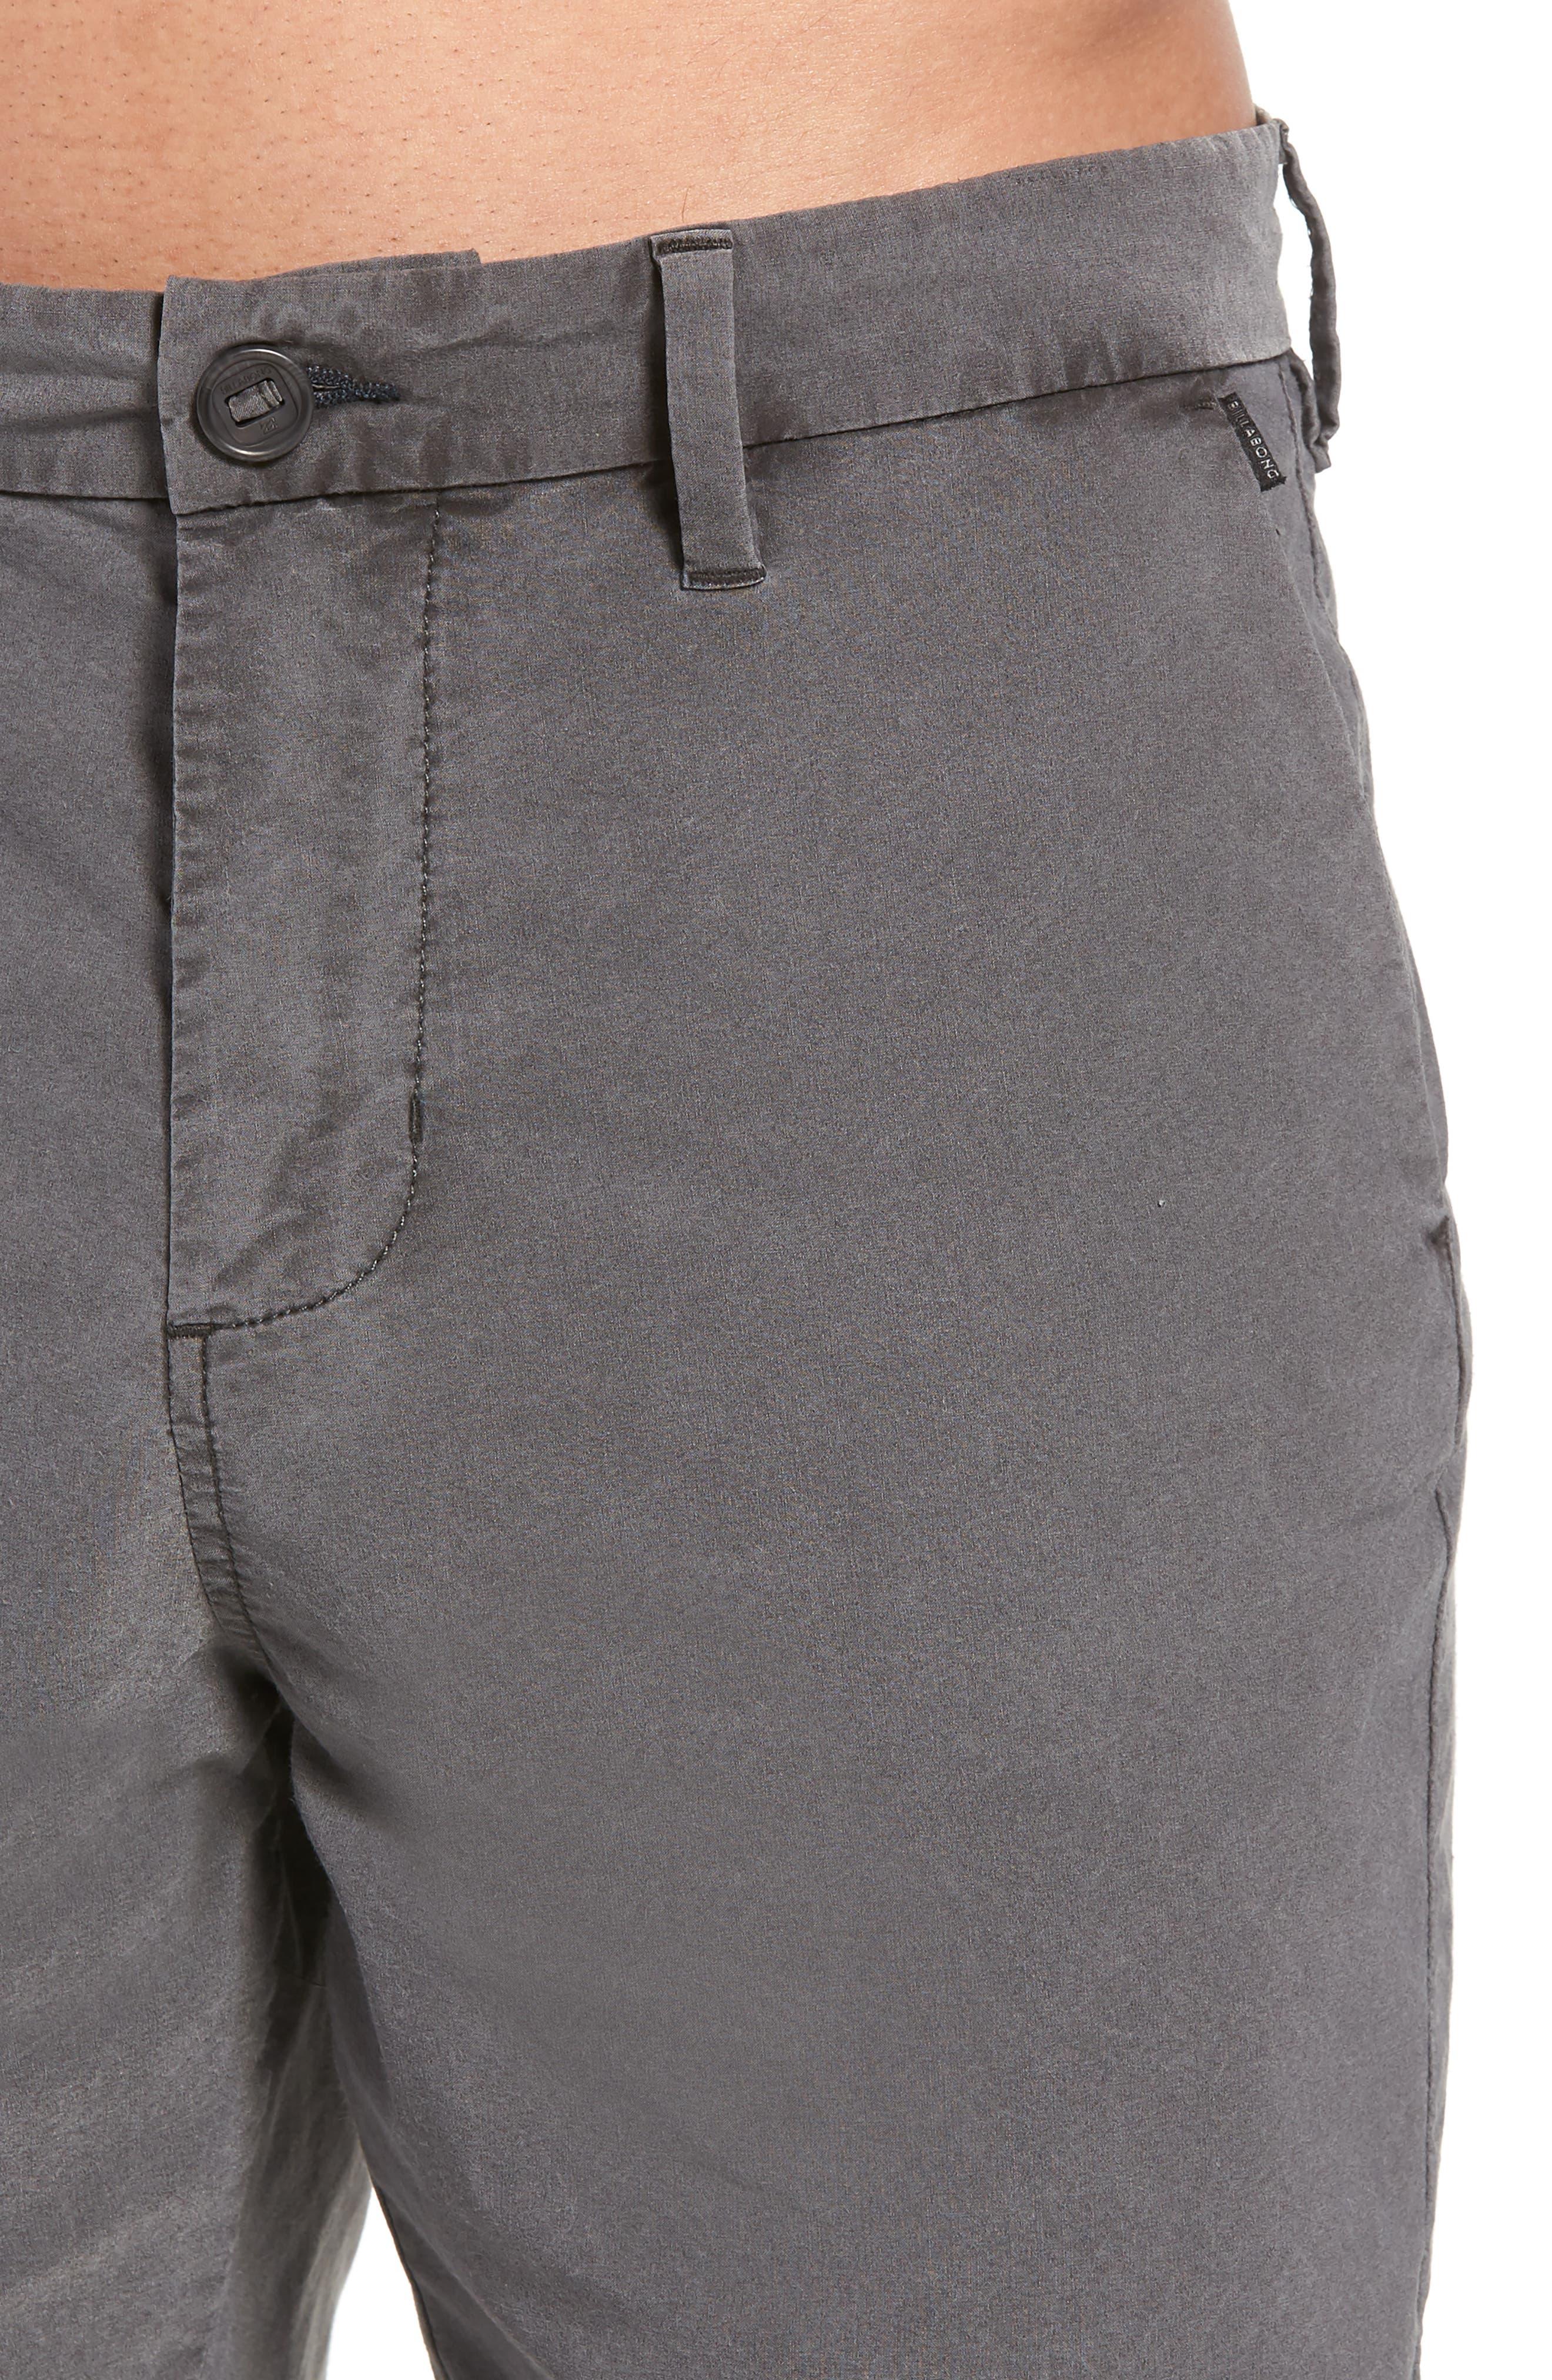 BILLABONG,                             New Order X Overdye Hybrid Shorts,                             Alternate thumbnail 4, color,                             001